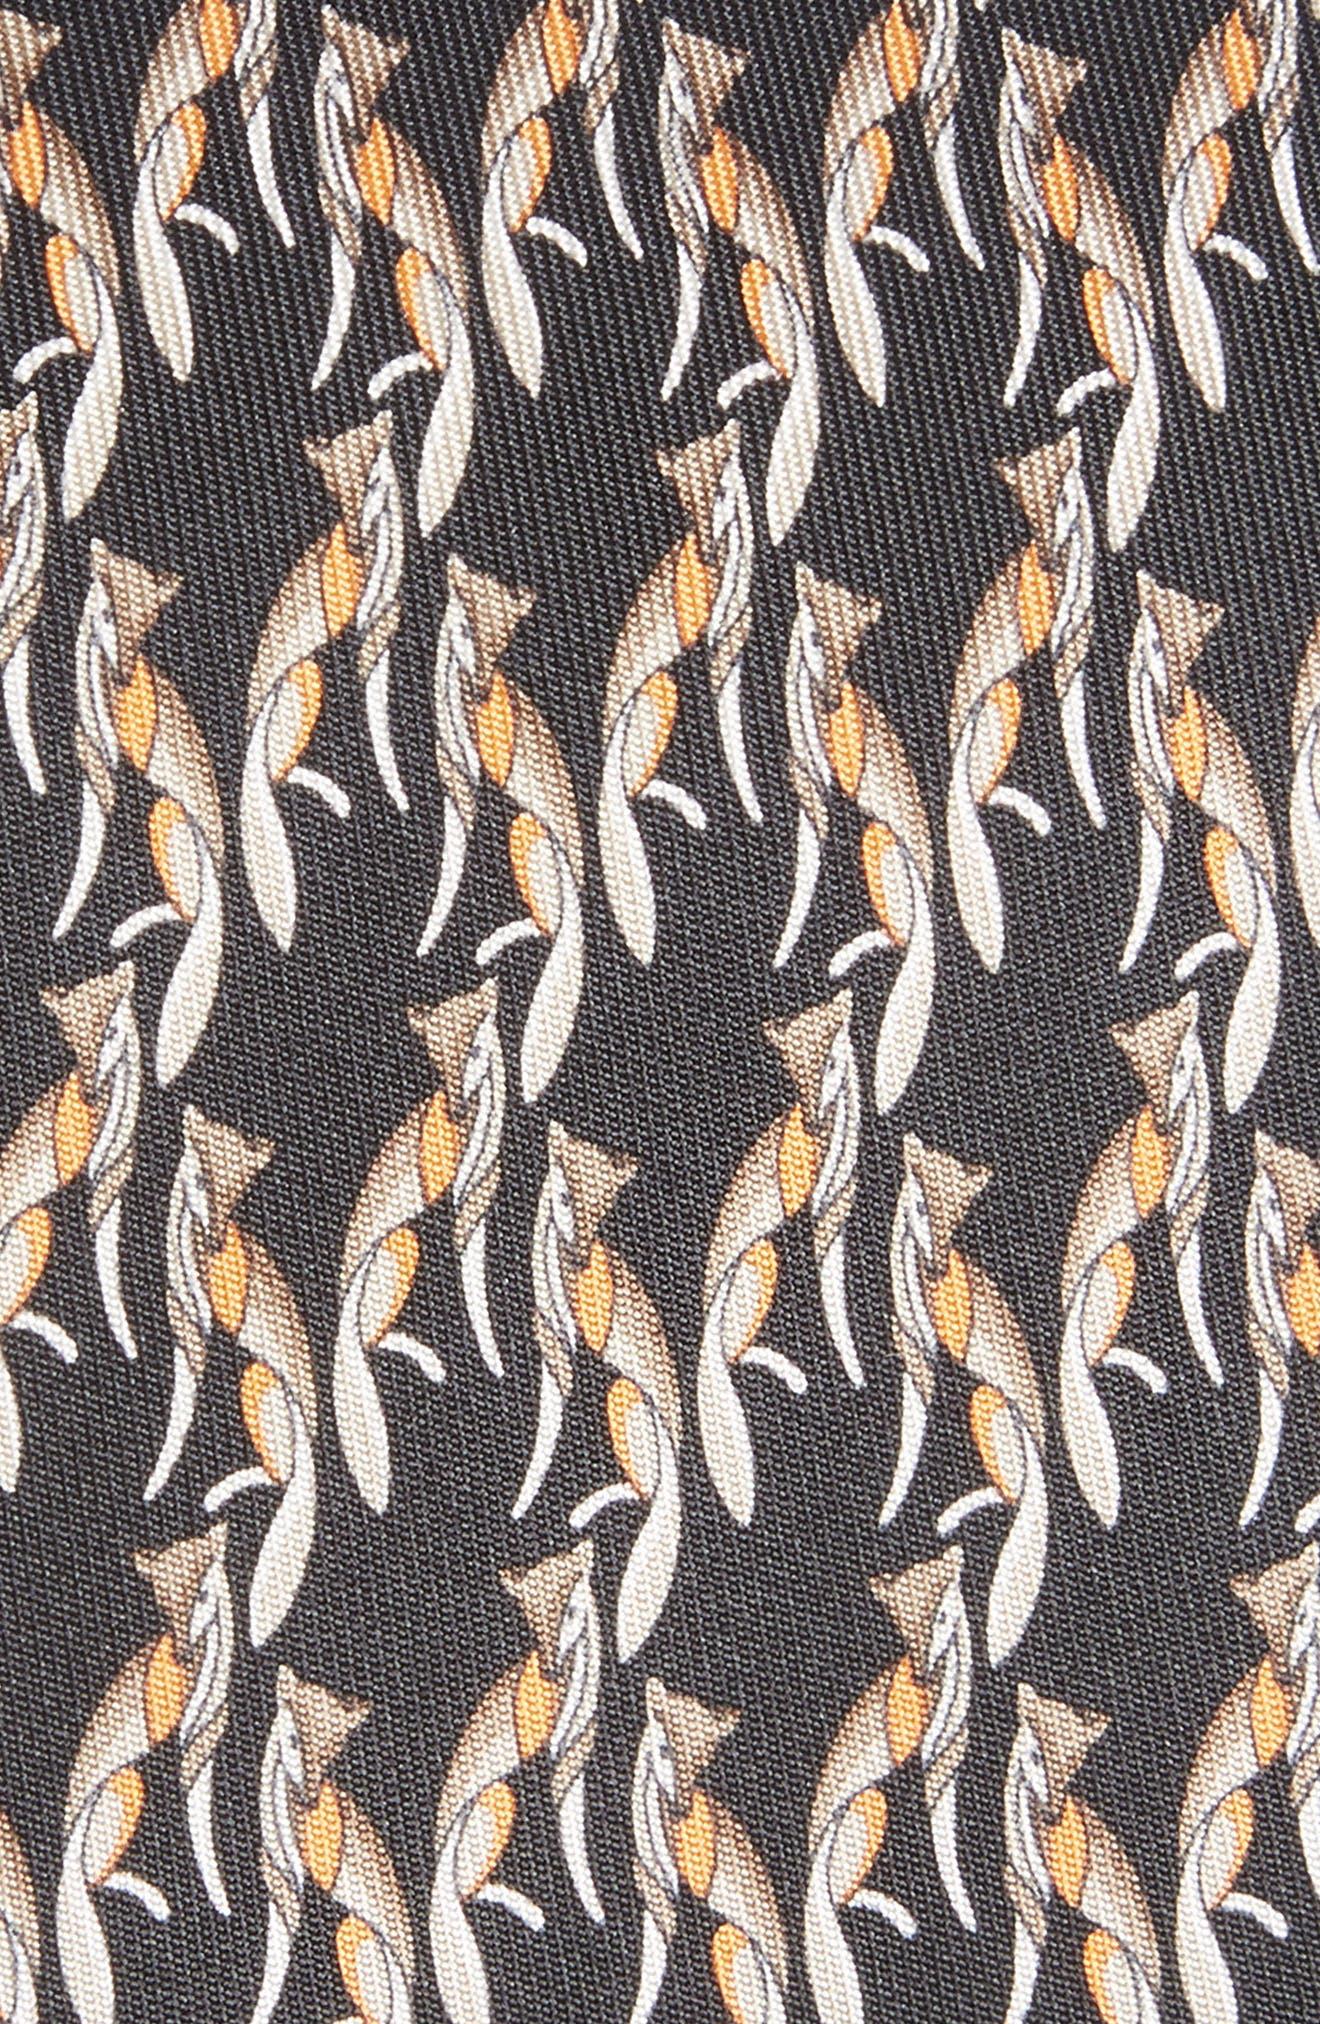 Fidia Print Silk Tie,                             Alternate thumbnail 2, color,                             BLACK